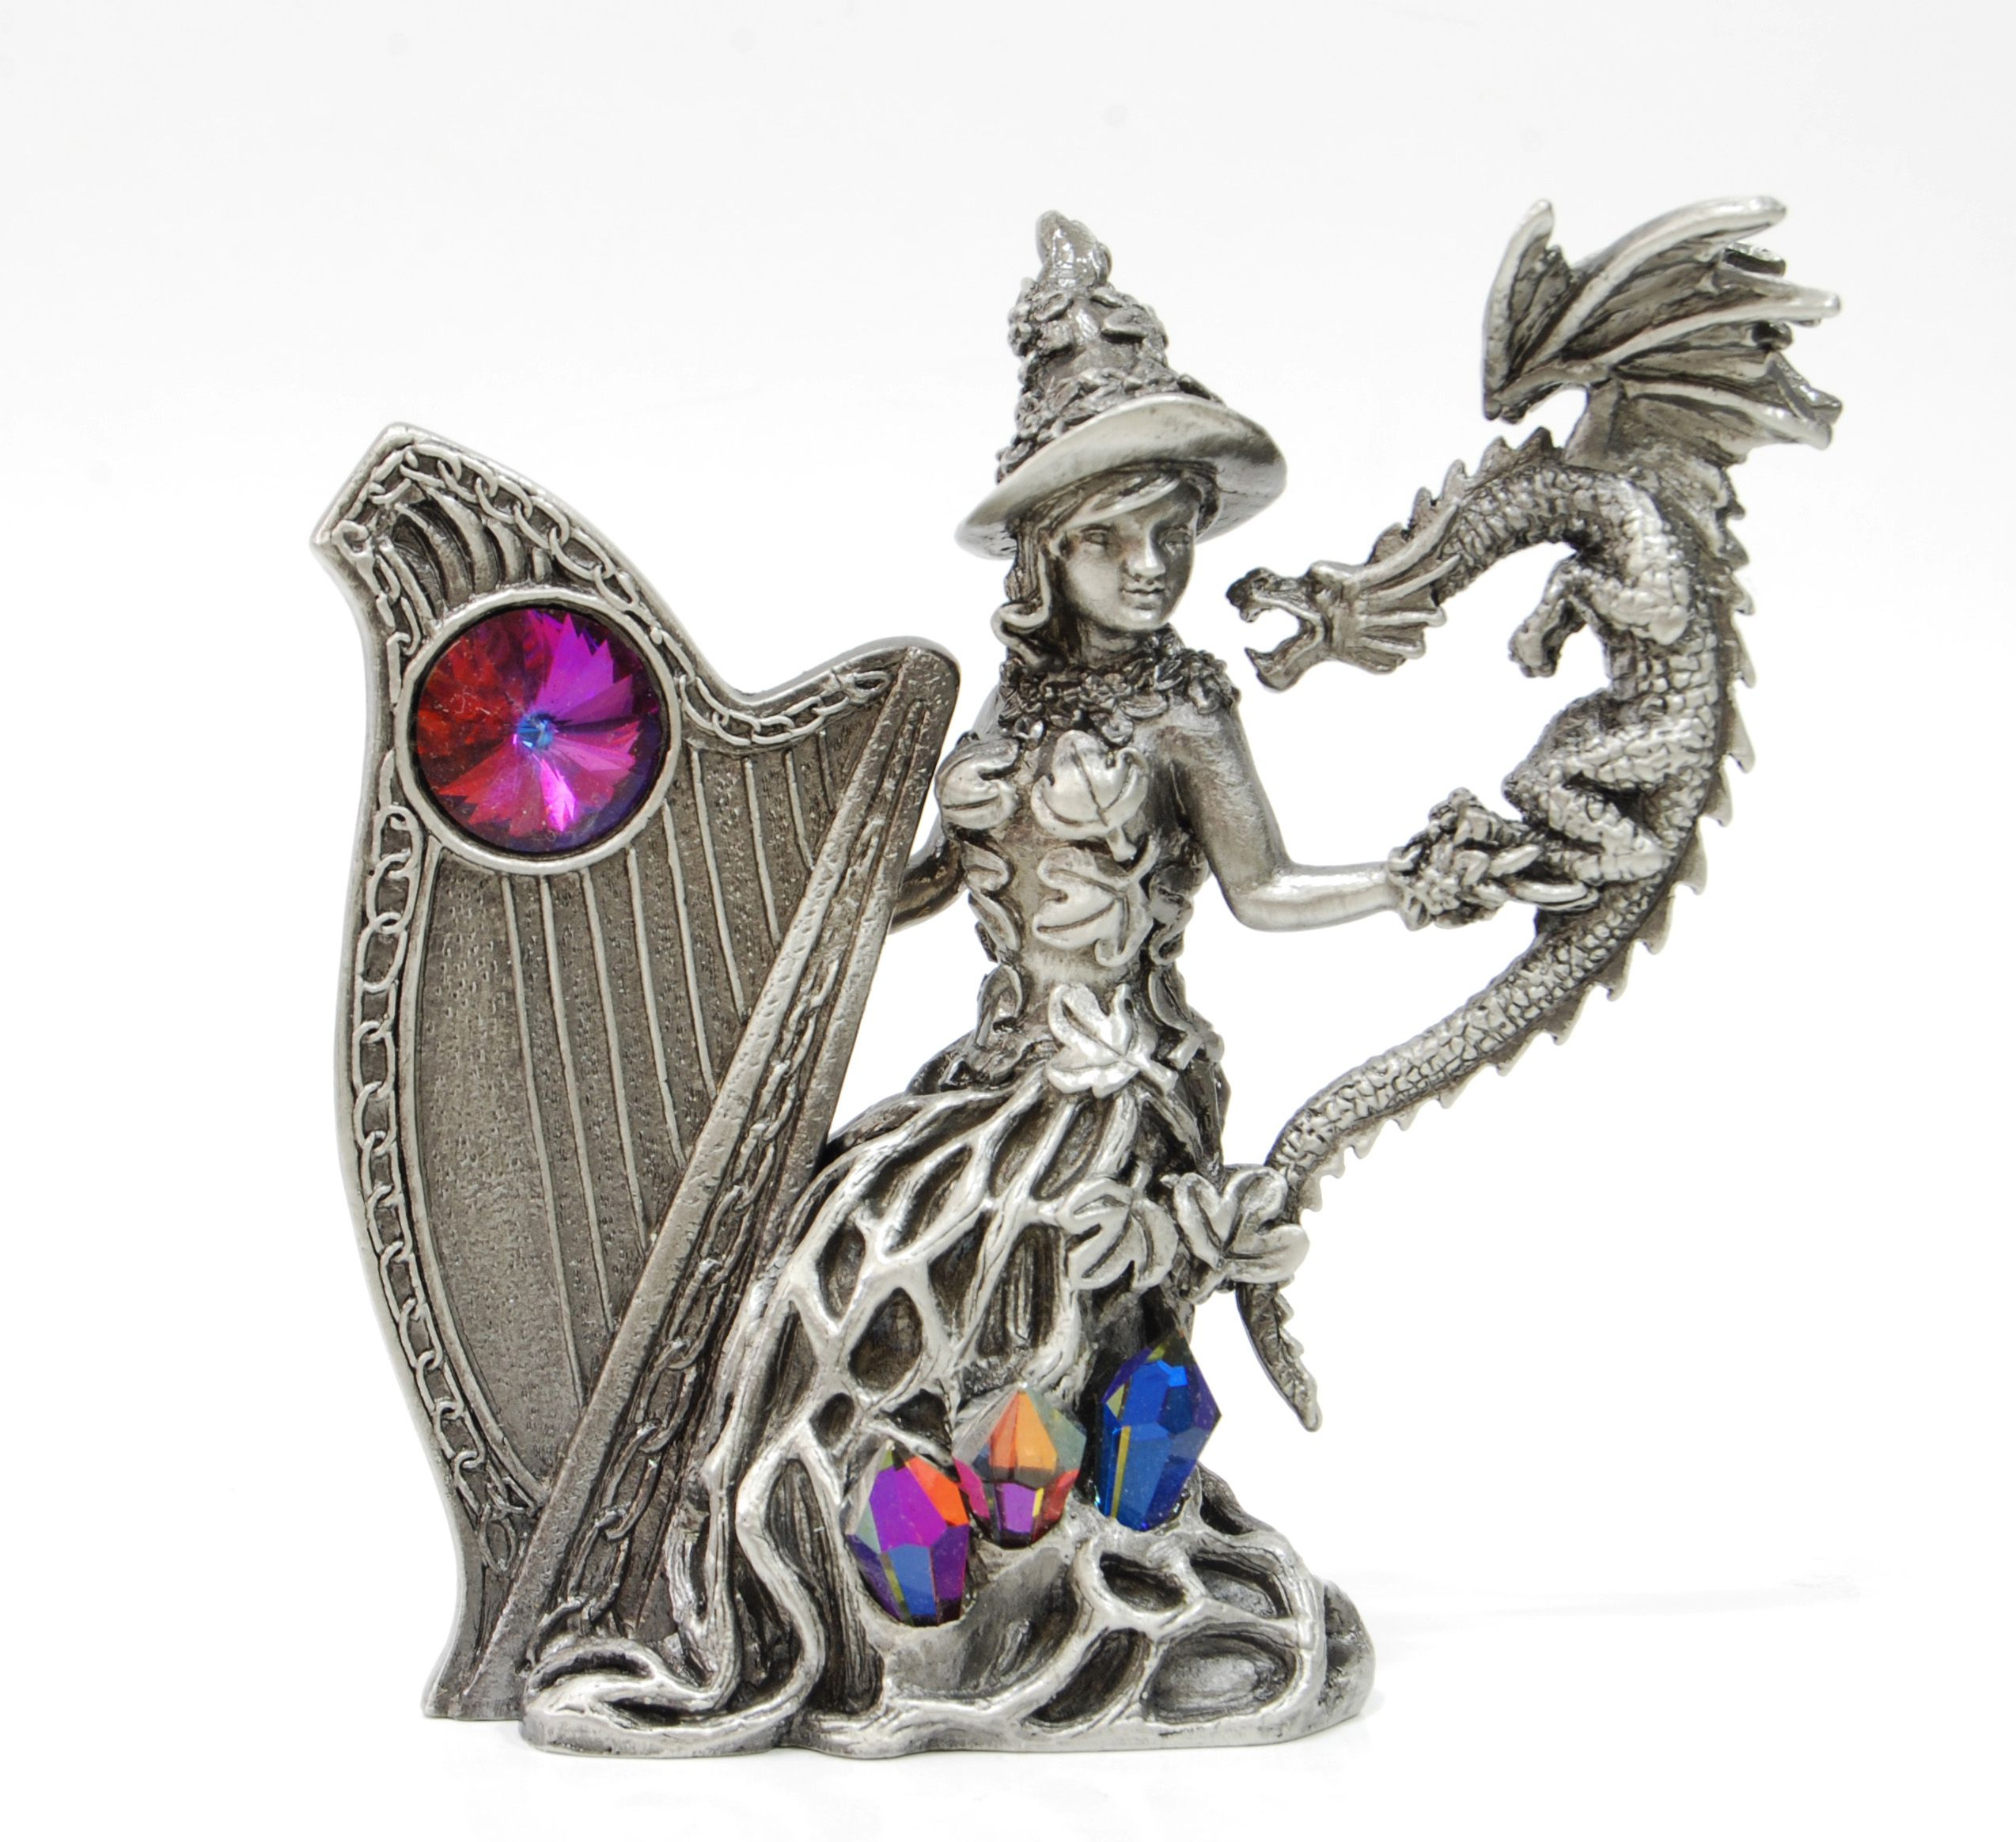 Xystos fantasy brand 'Myth & Magic'. www.xystostrade.co.uk